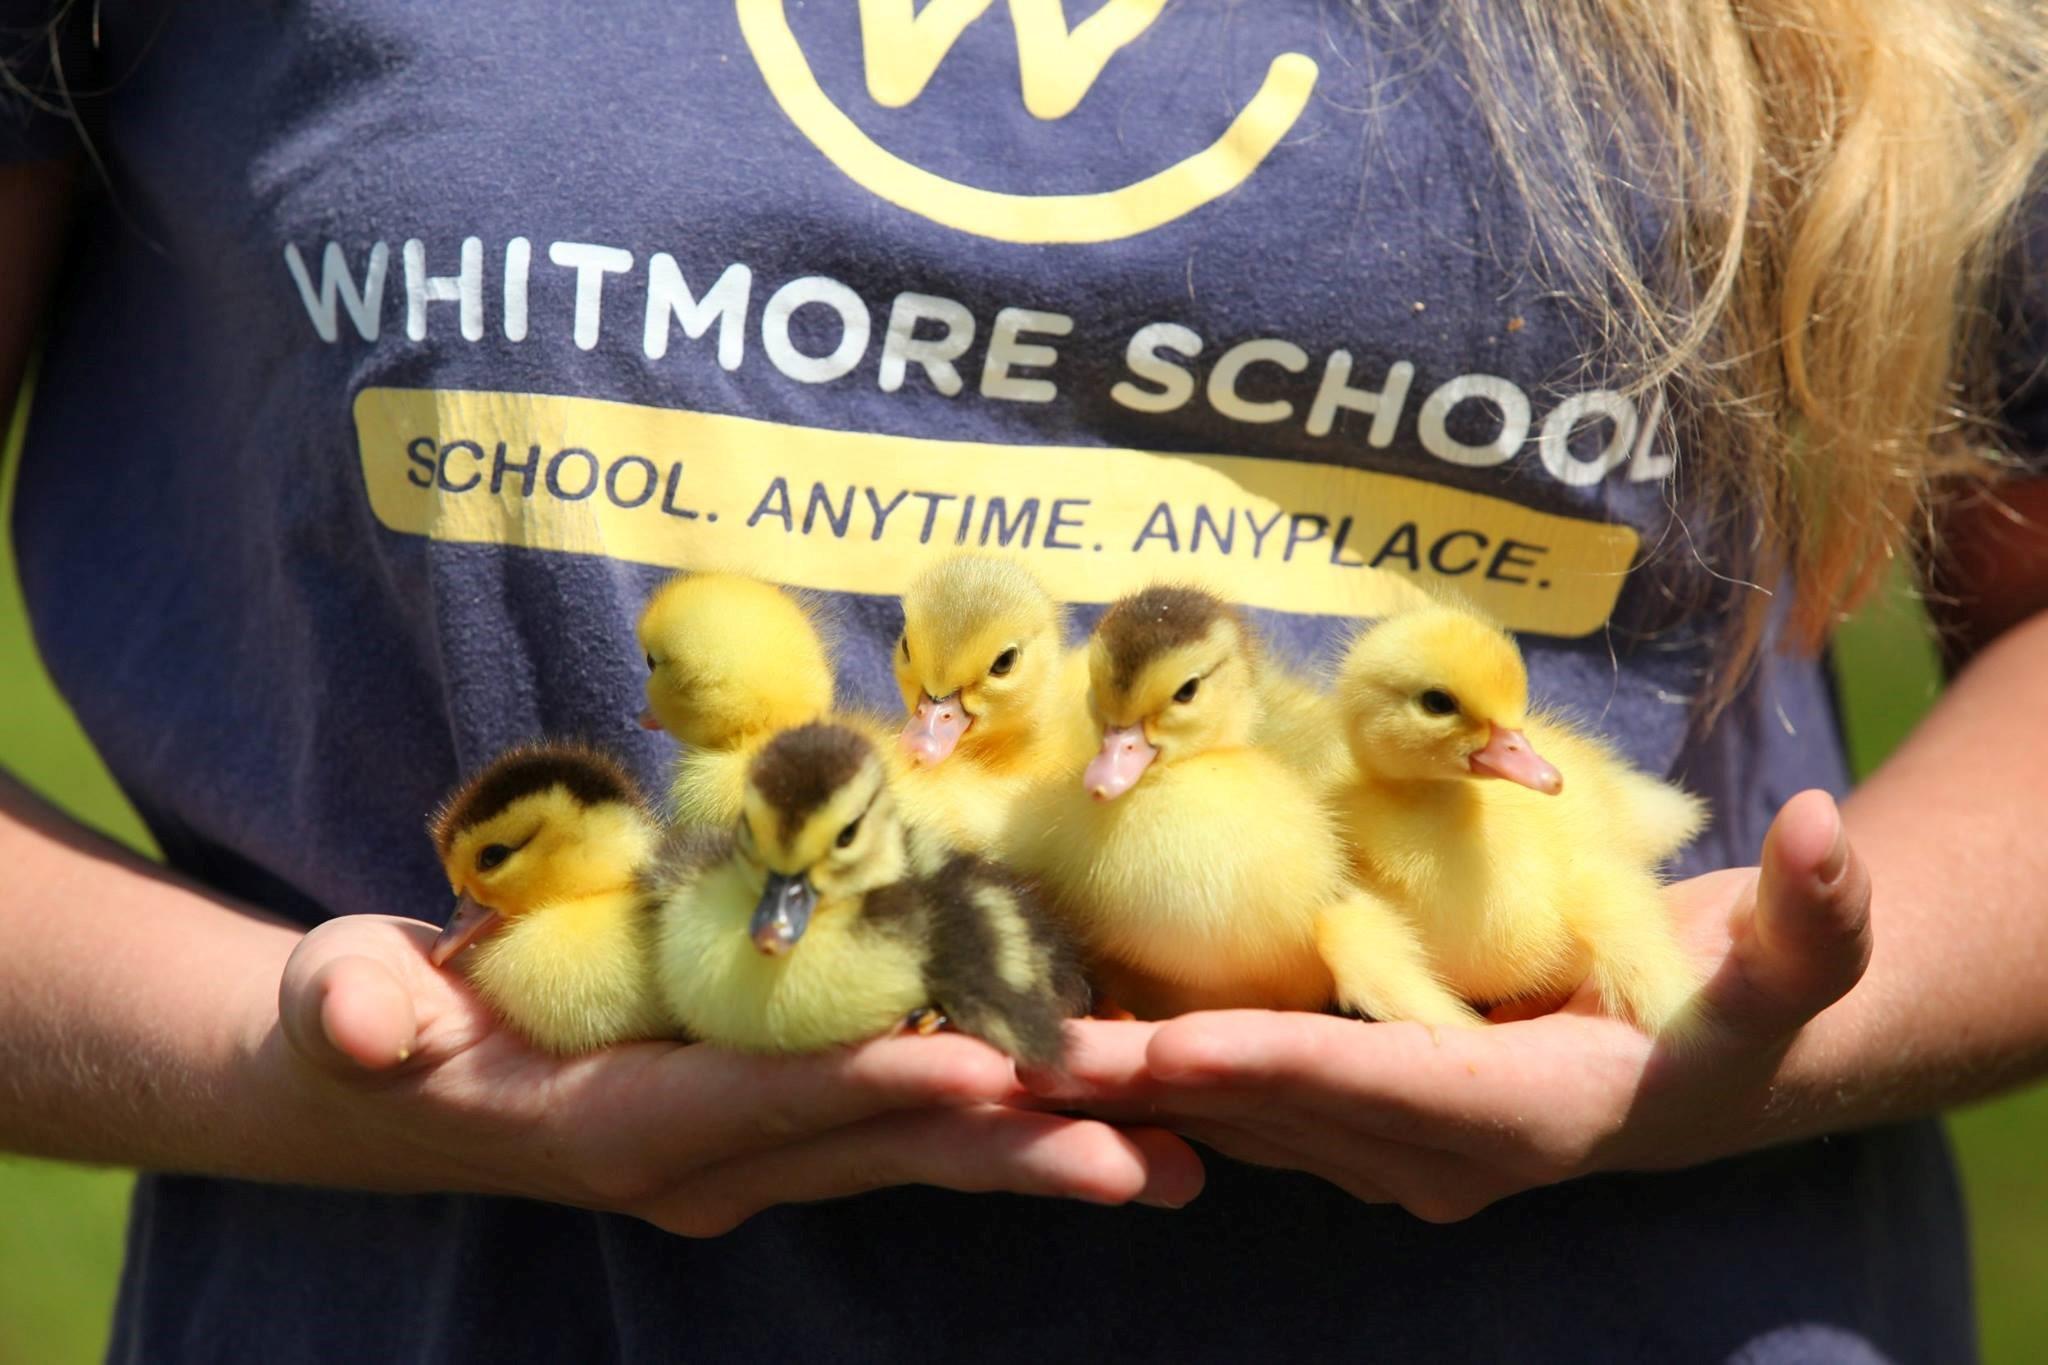 teen girl in Whitmore School T-shirt holding ducklings